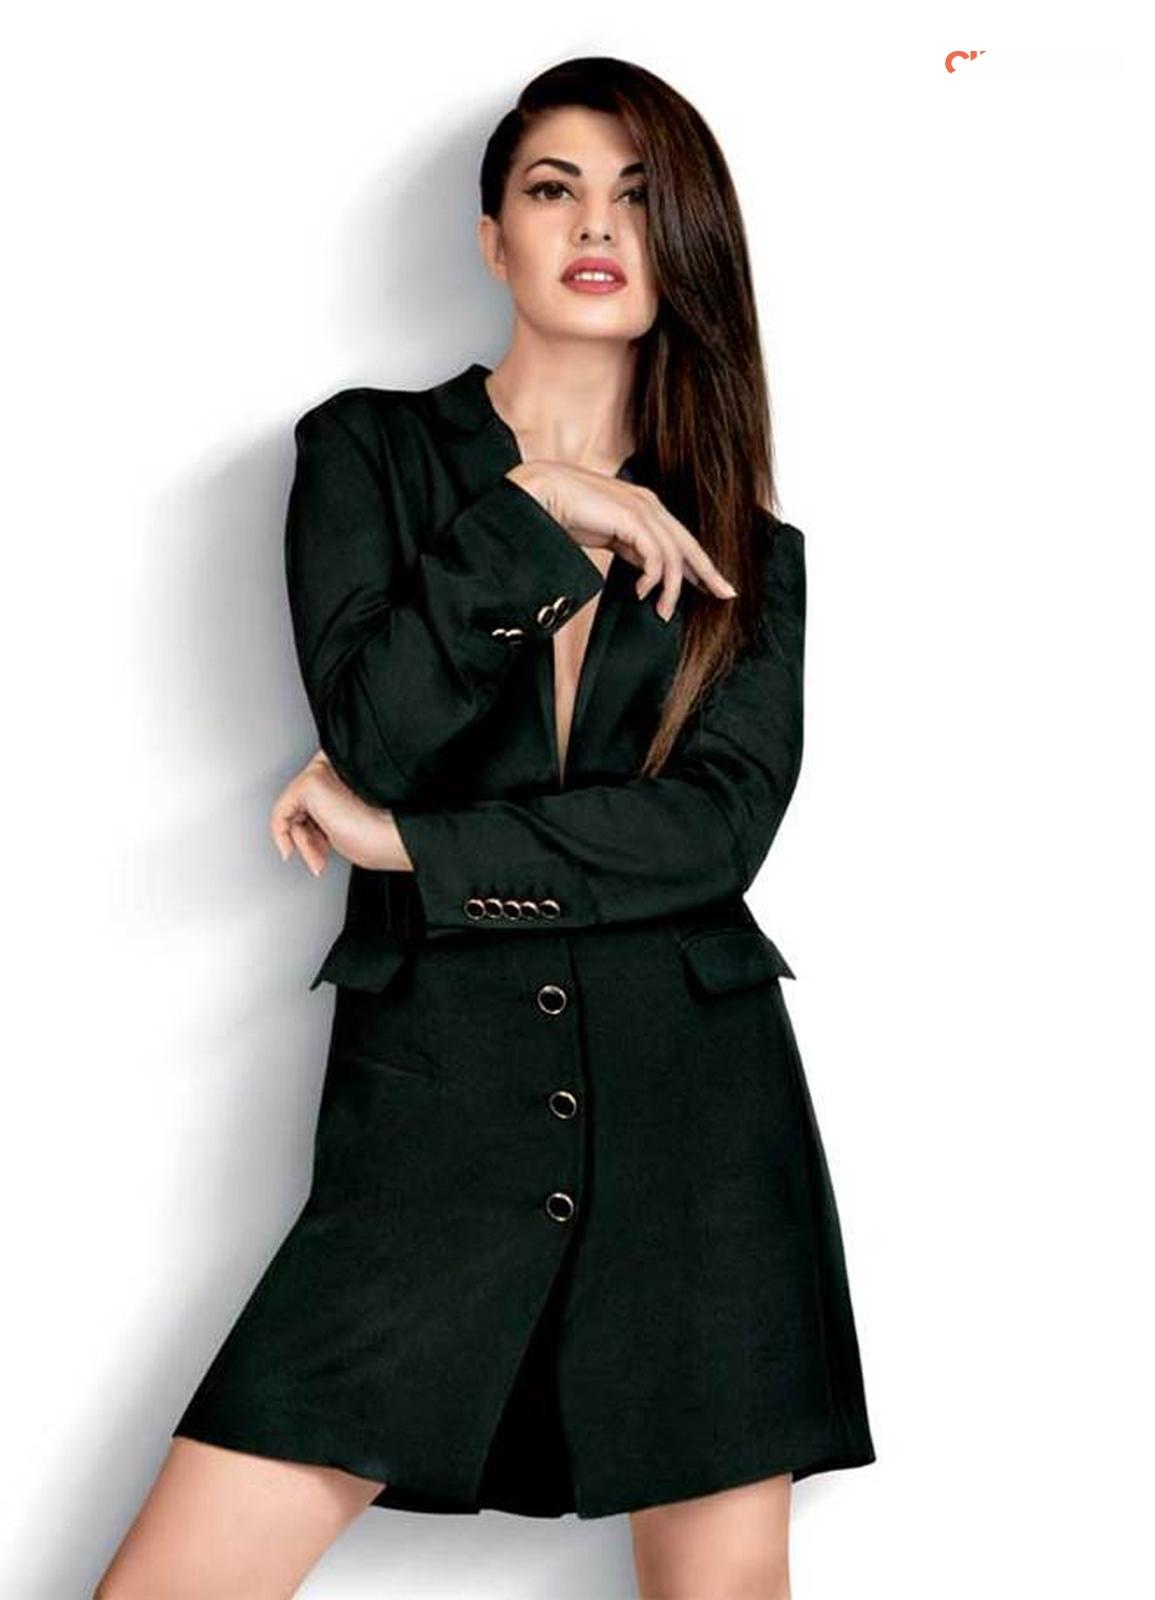 Jacqueline Fernandez Images Bollywood Actress Jacqueline Fernandez